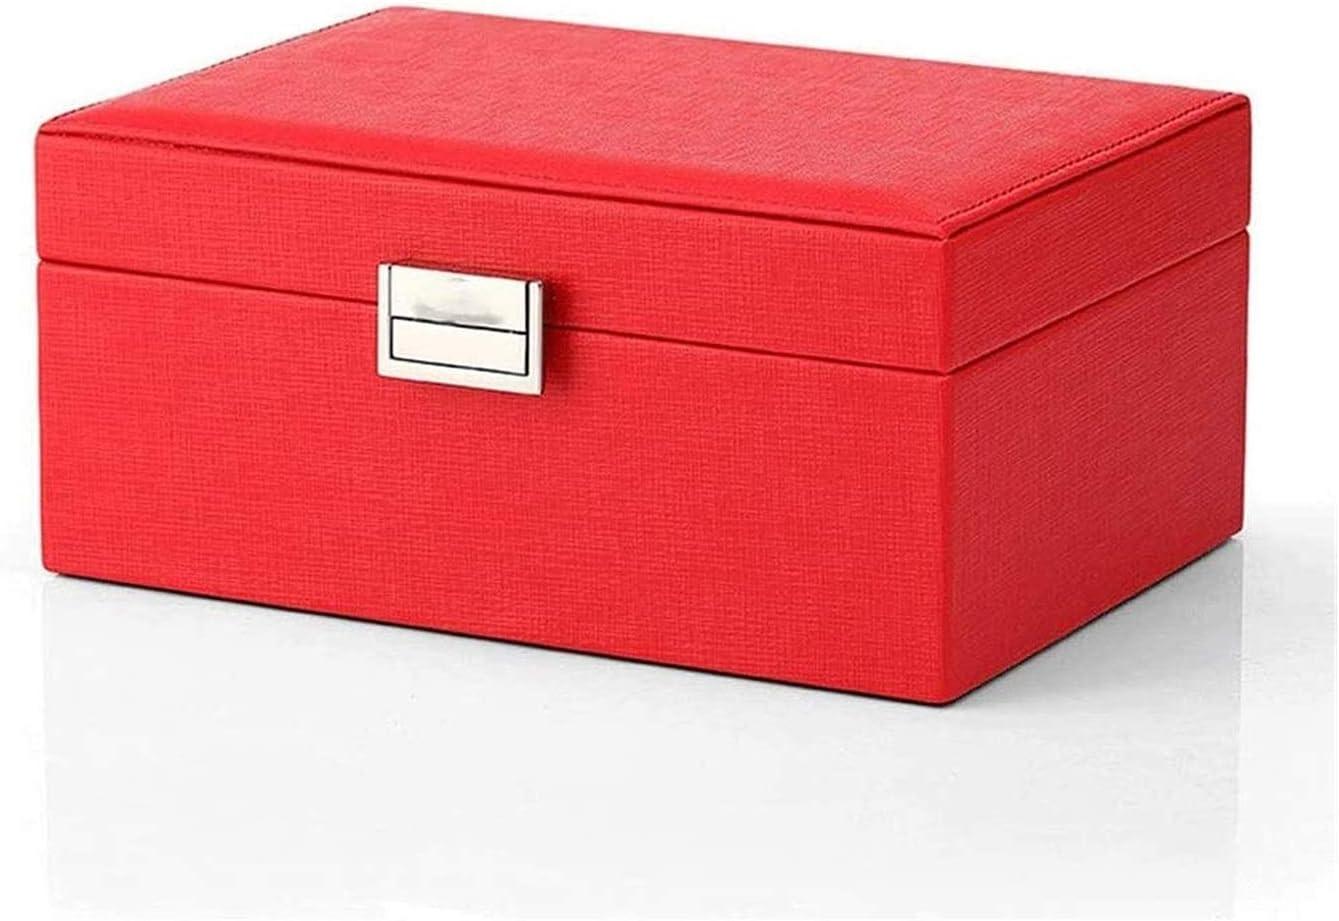 LHGH overseas Jewelry Box Christmas Two Gift Layers Las Vegas Mall Birthday